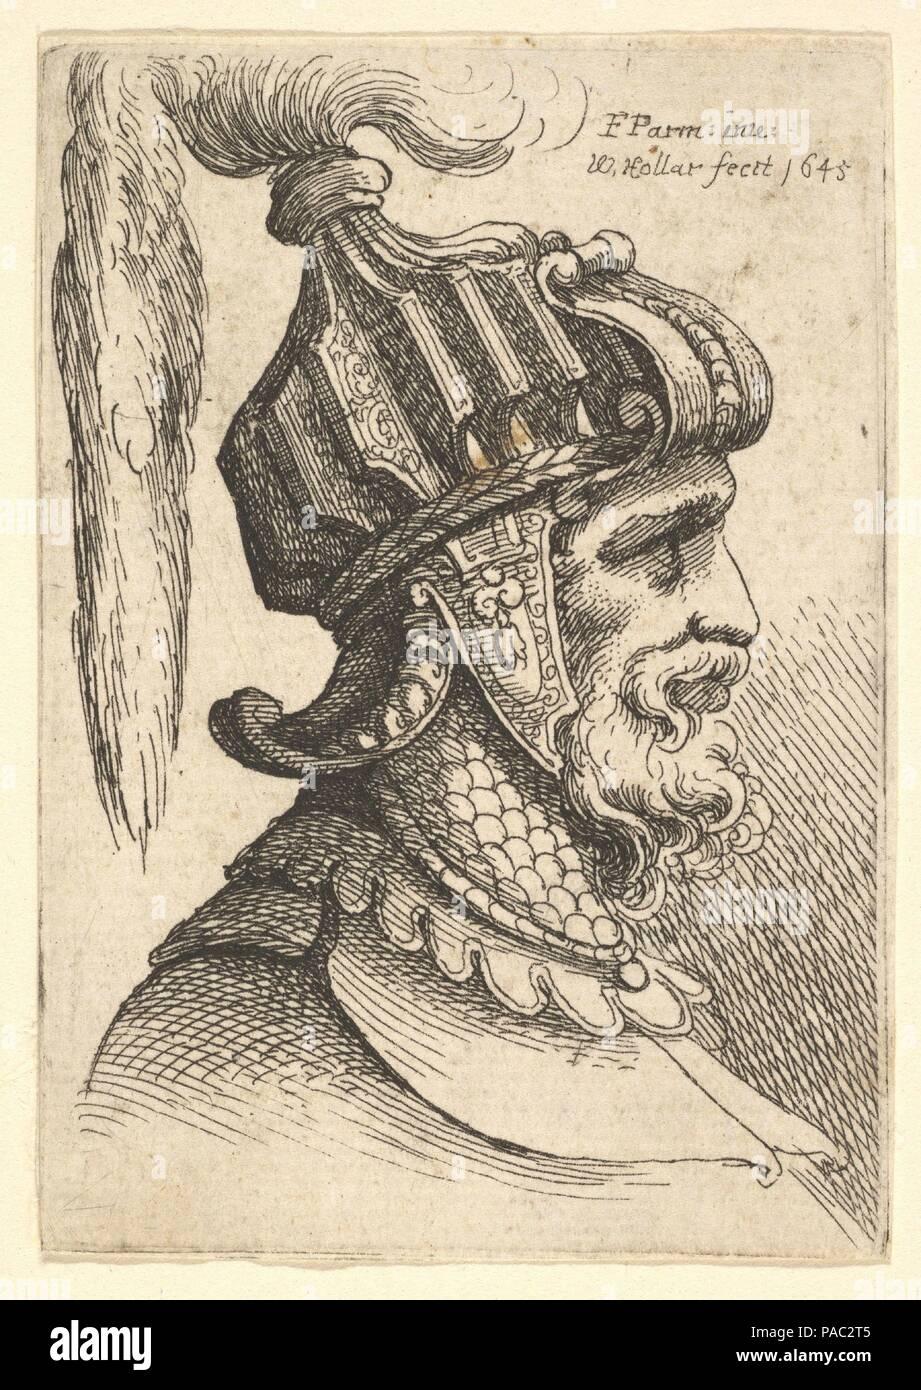 ac788b034 Helmeted testa. Artista  Dopo Parmigianino (Girolamo Francesco Maria  Mazzola) (italiano